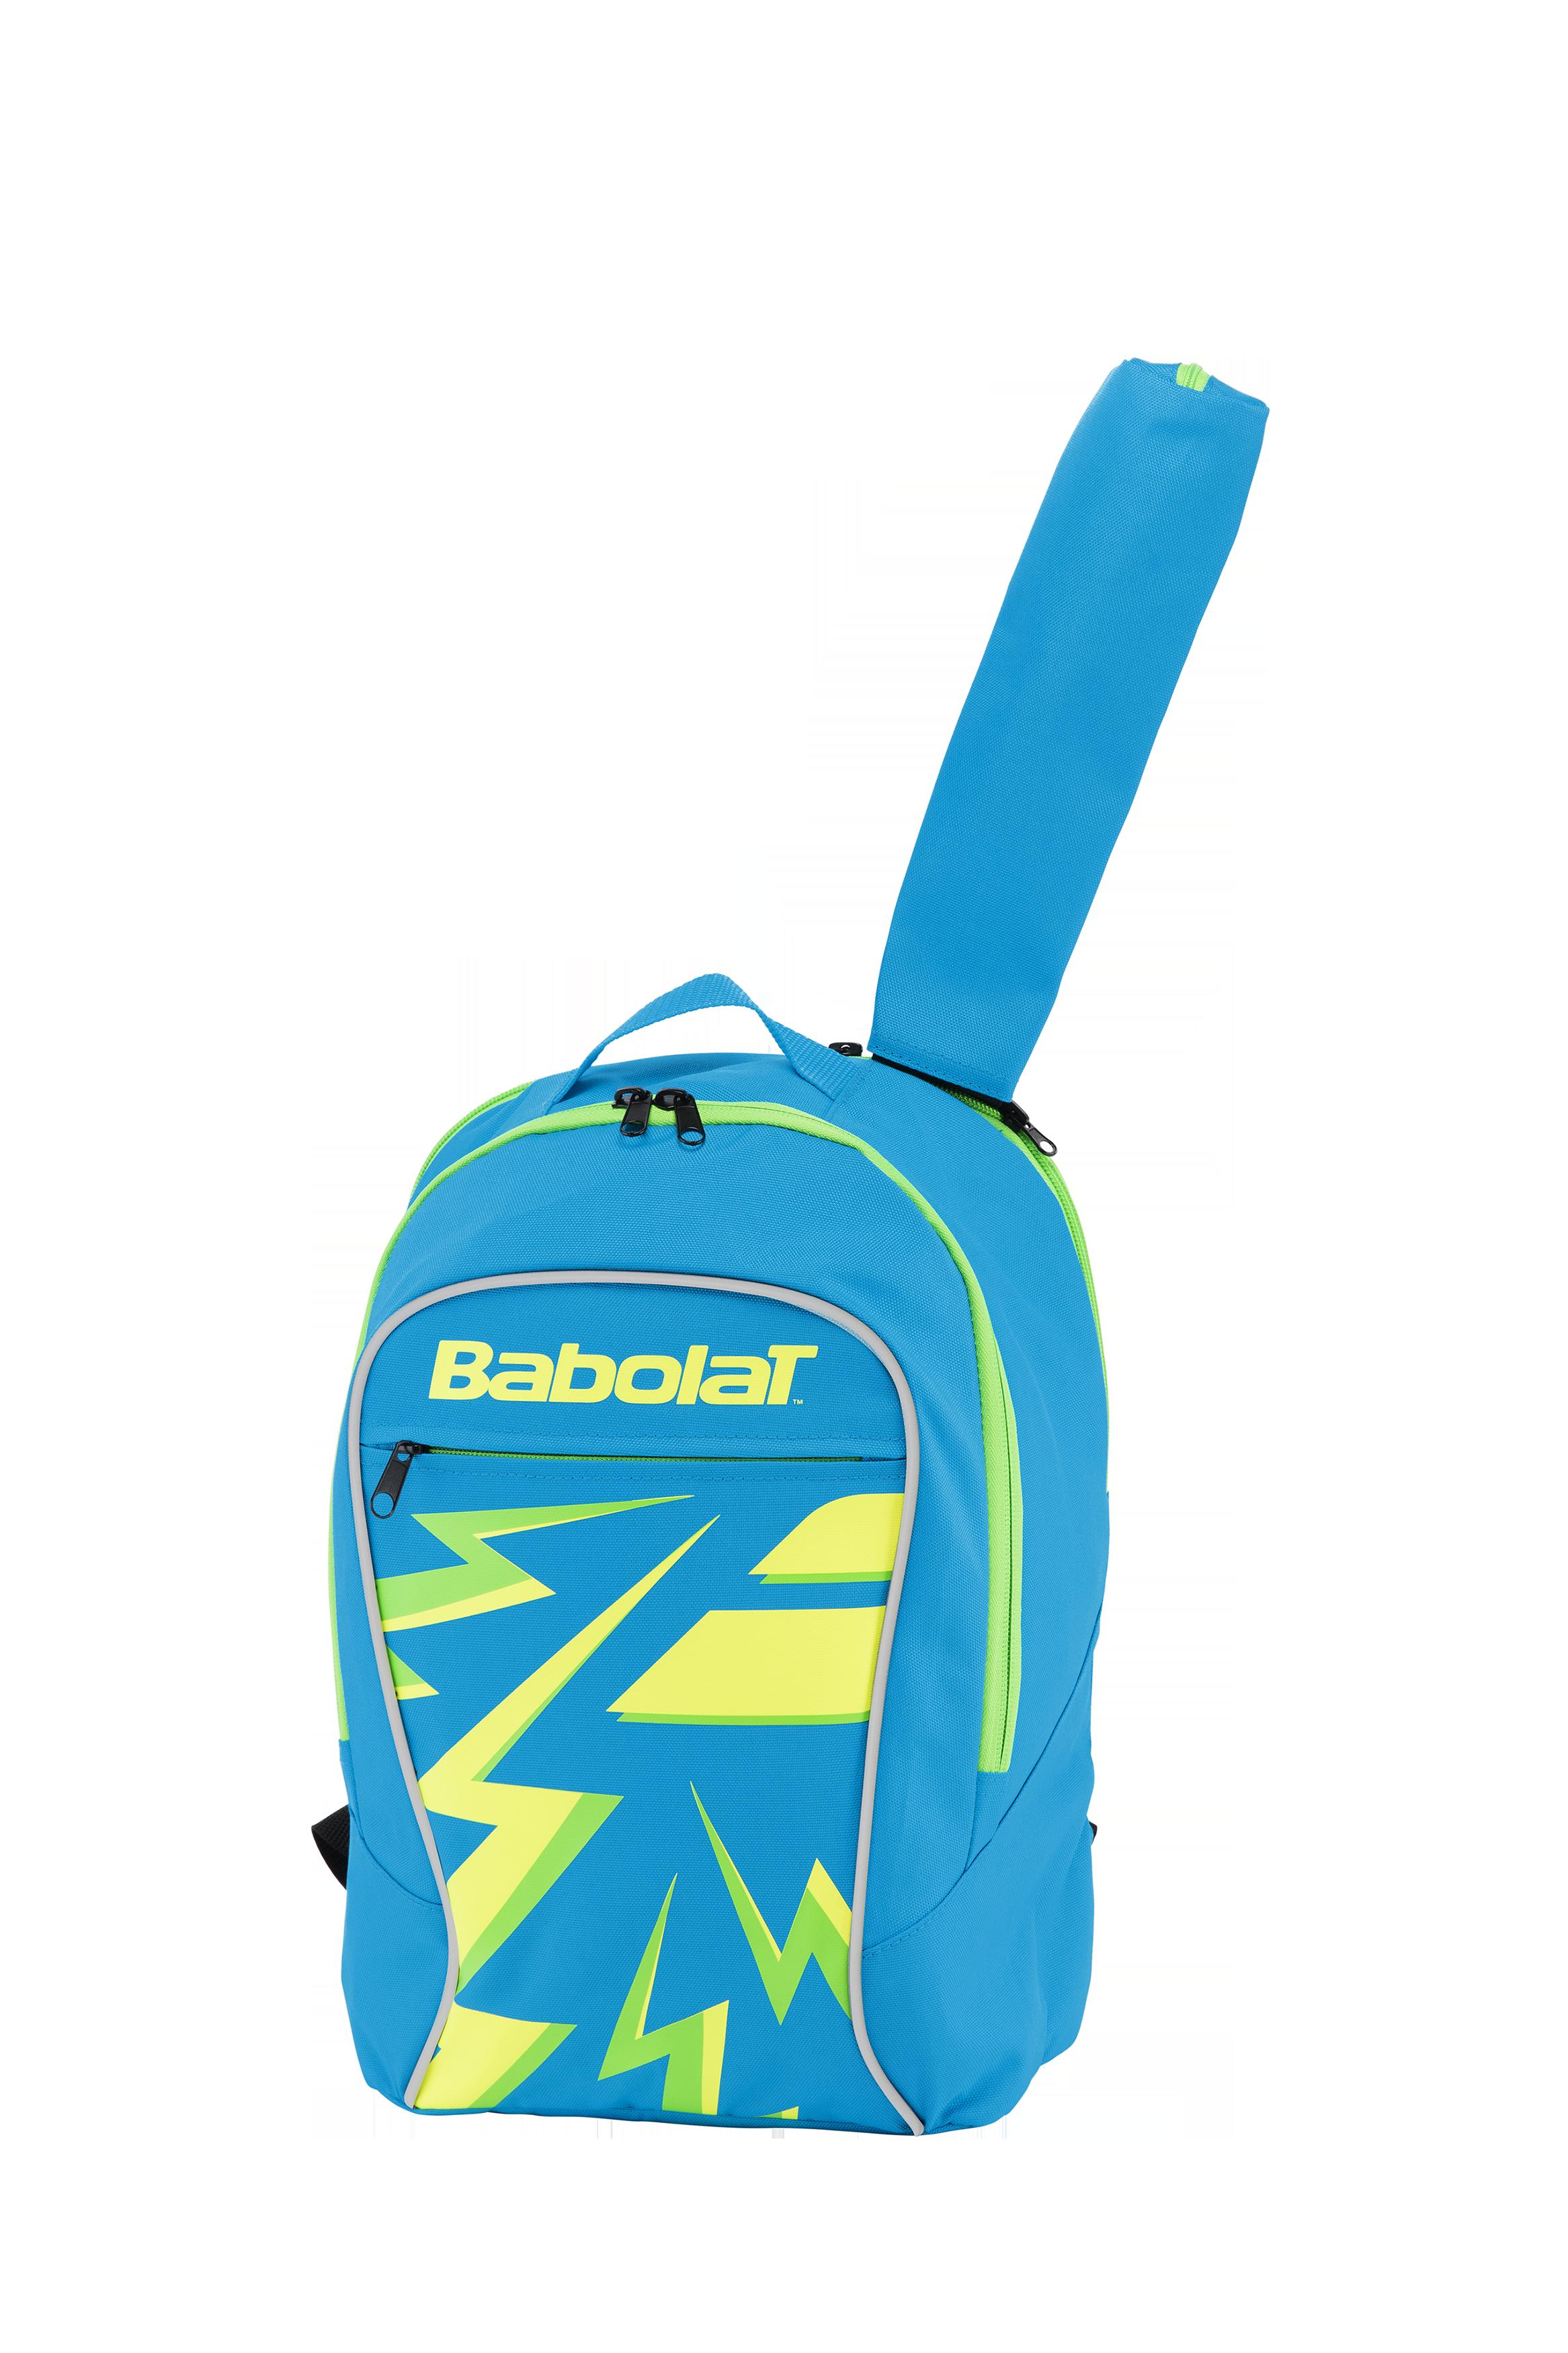 Babolat Club Line Backpack Boy 2017